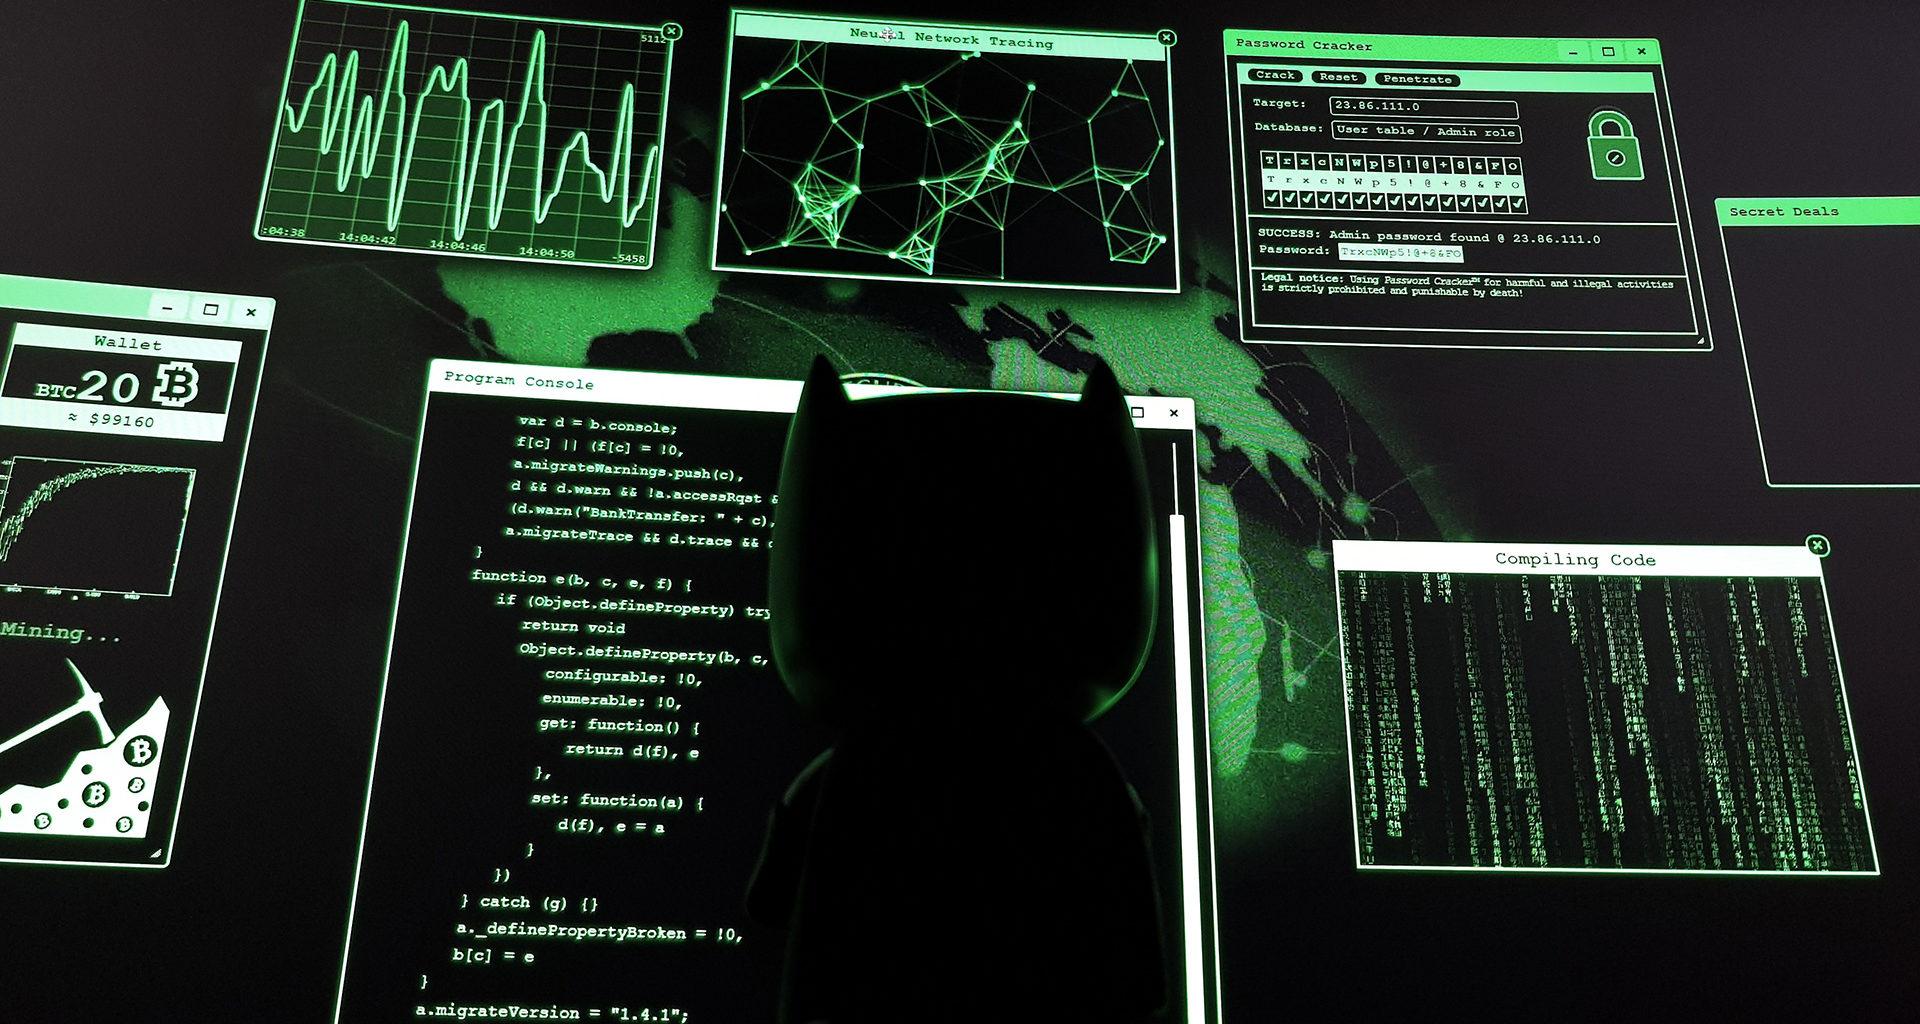 Batman hacker